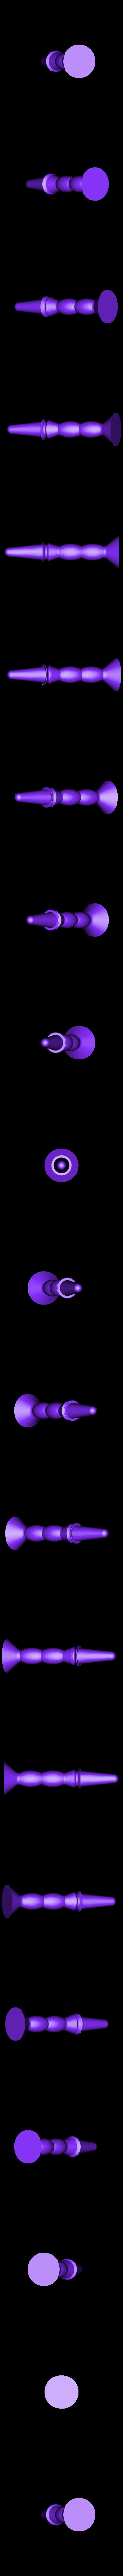 bilboquet.STL Download free STL file Bilboquet • 3D print object, CedricRoy